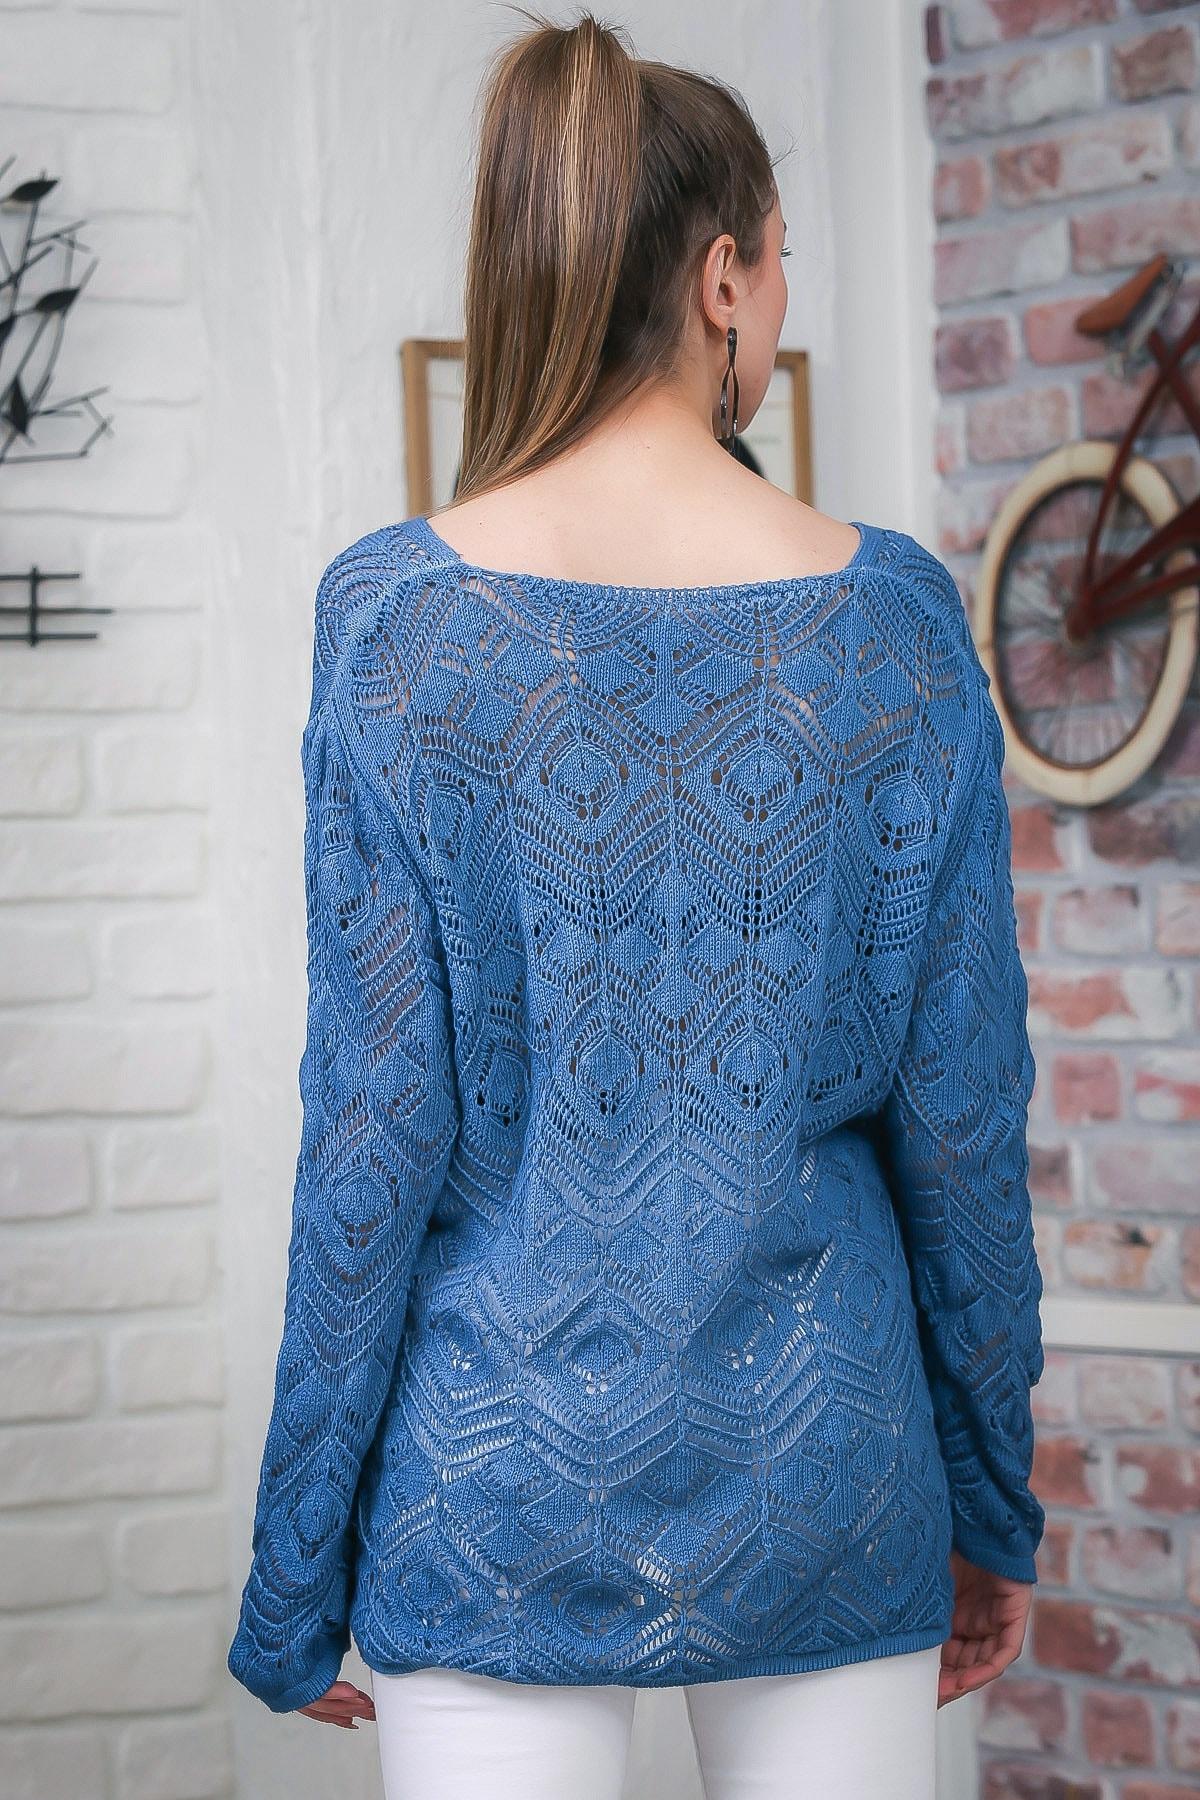 Chiccy Kadın Mavi V Yaka Ajurlu Salaş Triko Bluz M10010200BL95553 4